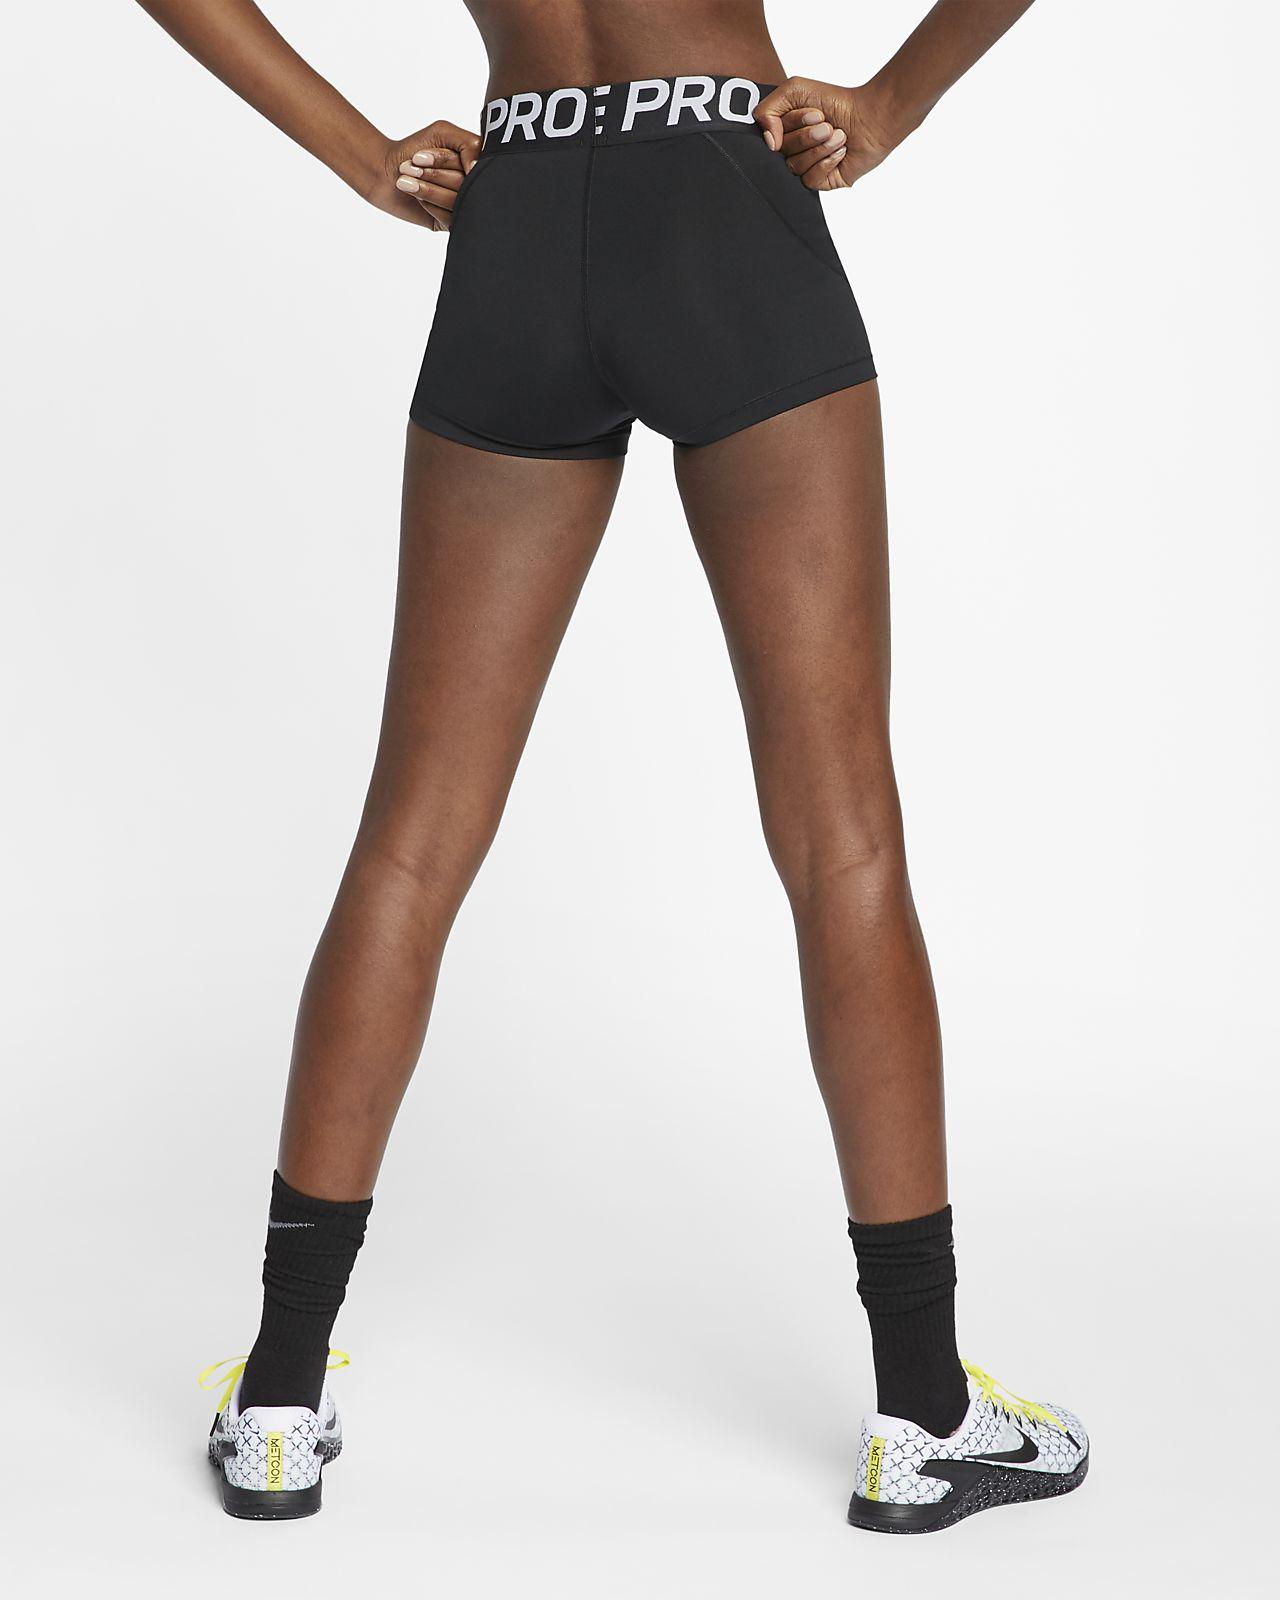 ShortsKjol, NikeCourt Dri Skirt, stl L, Vit